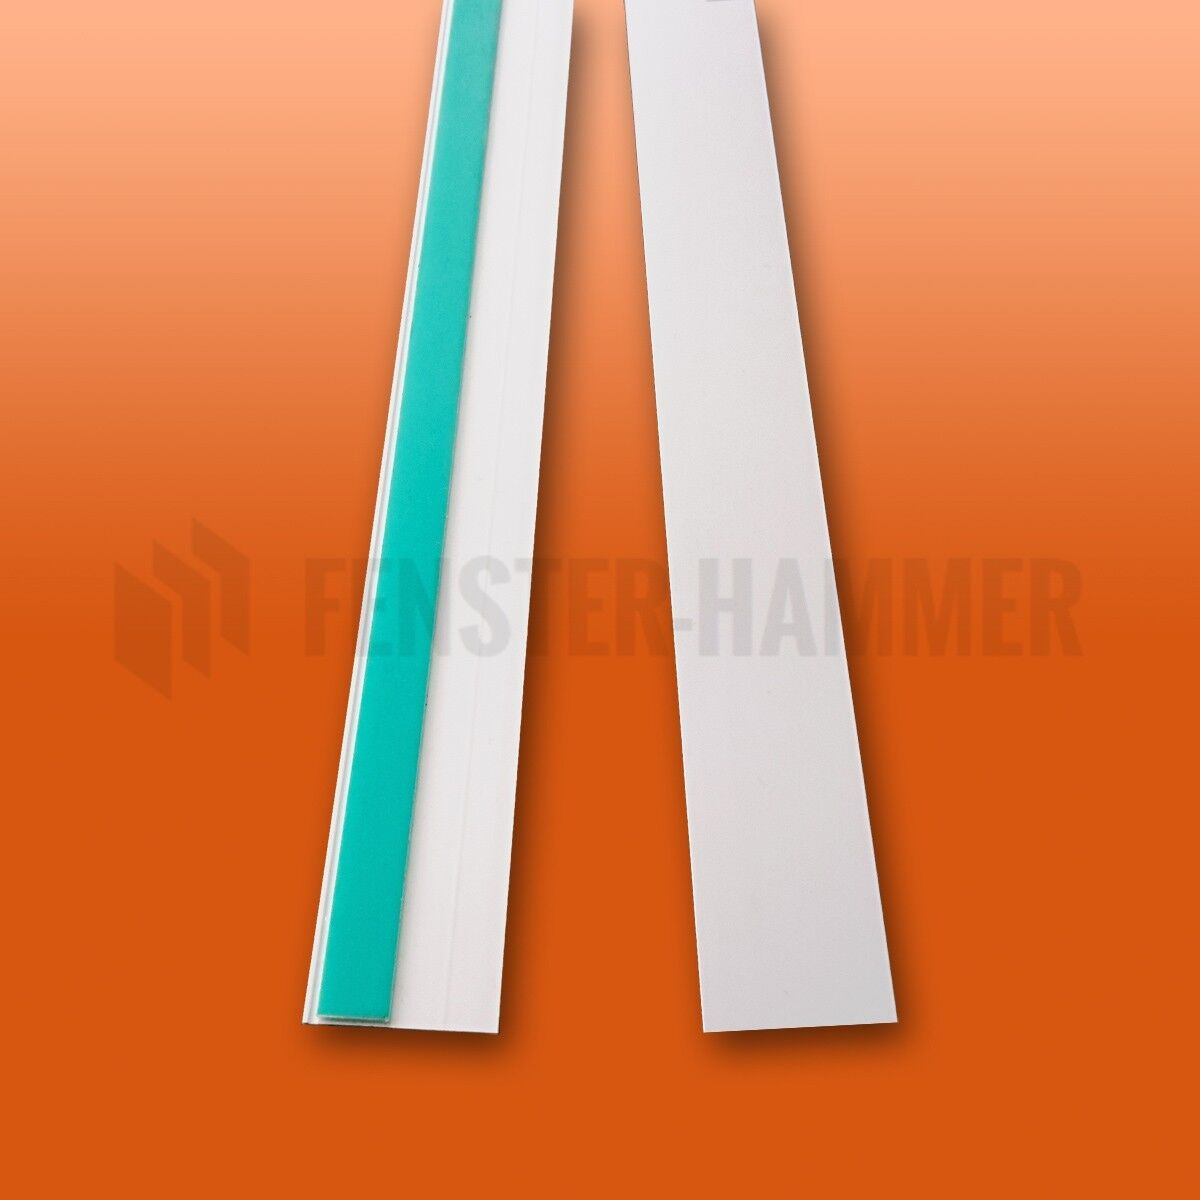 Fensterleiste Abdeckleiste Flachleiste Fensterleisten Kunststoffleiste